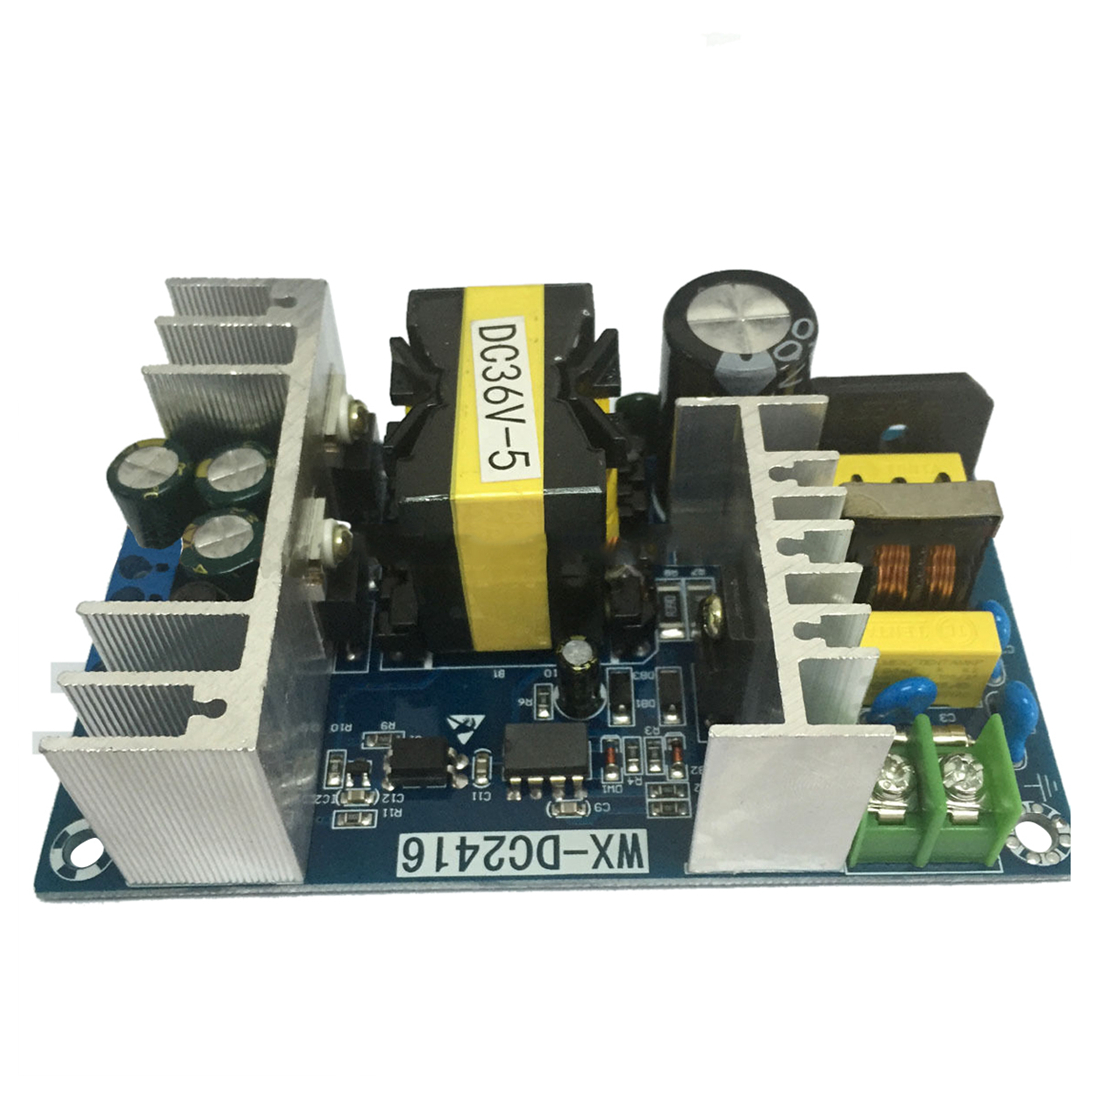 AC-DC Inverter Module 110V 220V 100-265V to 36V 5A Adapter Switching Power Supply AC-DC Inverter Module 110V 220V 100-265V to 36V 5A Adapter Switching Power Supply